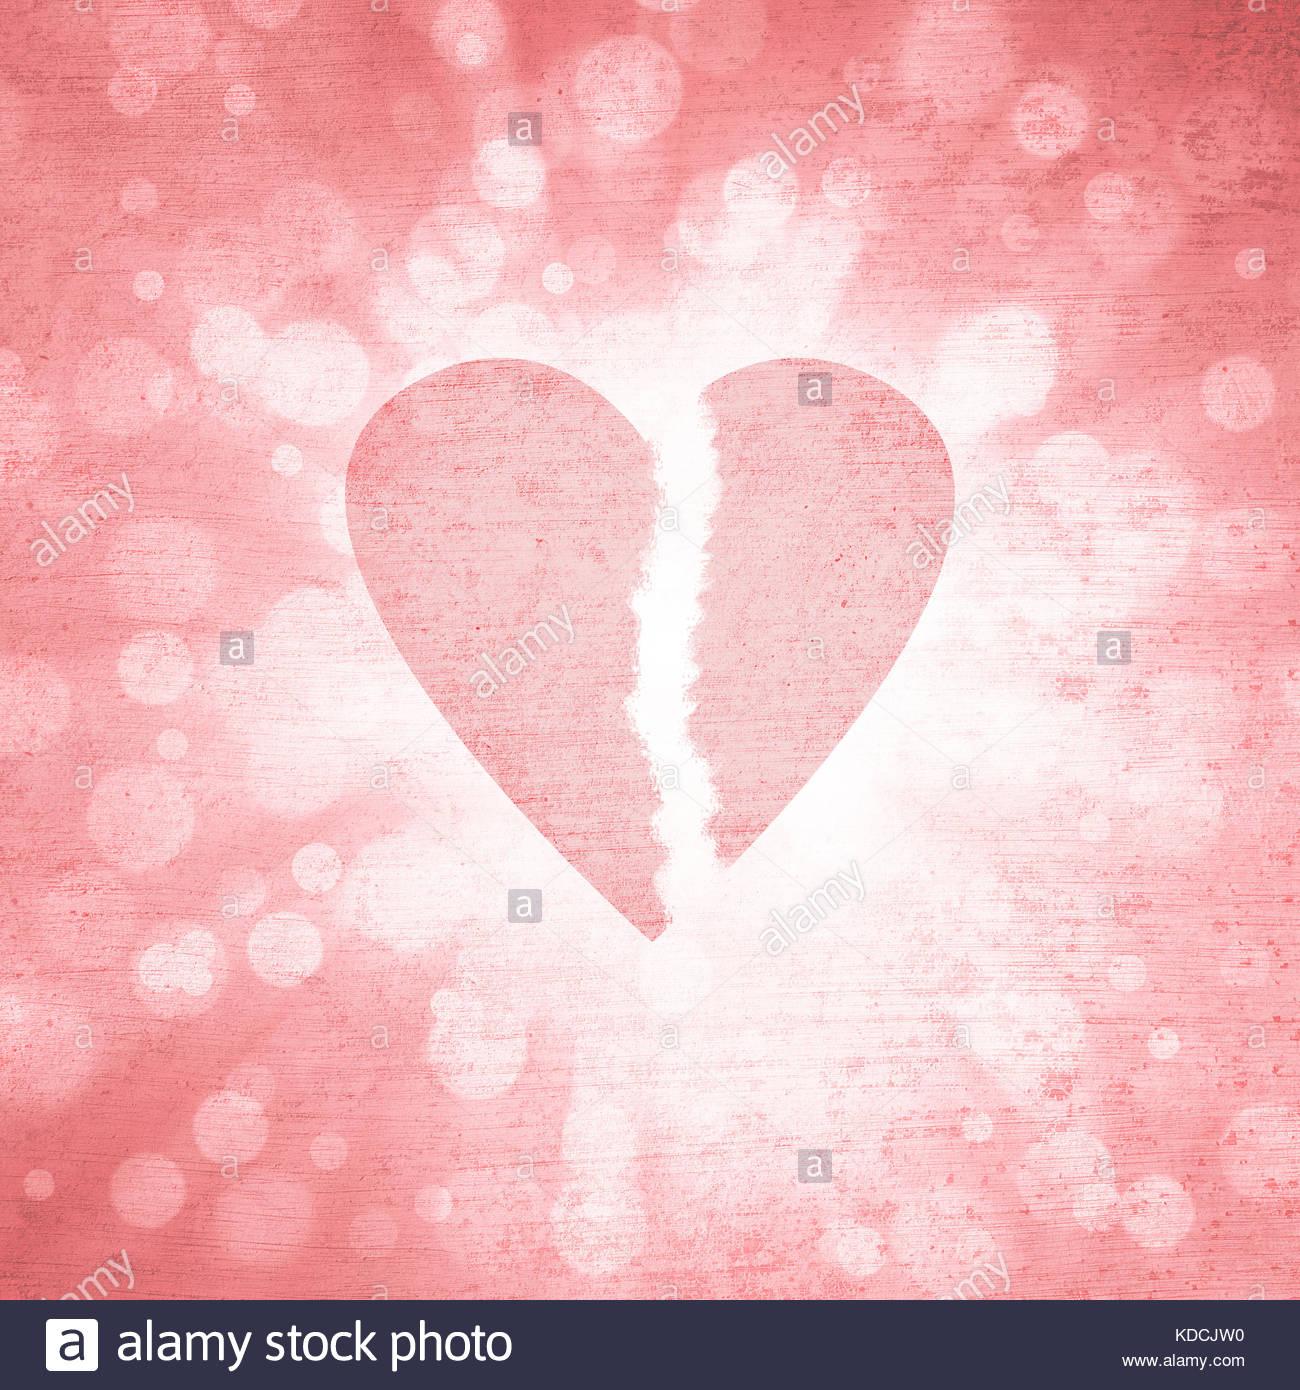 Grunge textured bright red color broken heart symbol on grunge radial blurred red light bokeh illustration background. - Stock Image